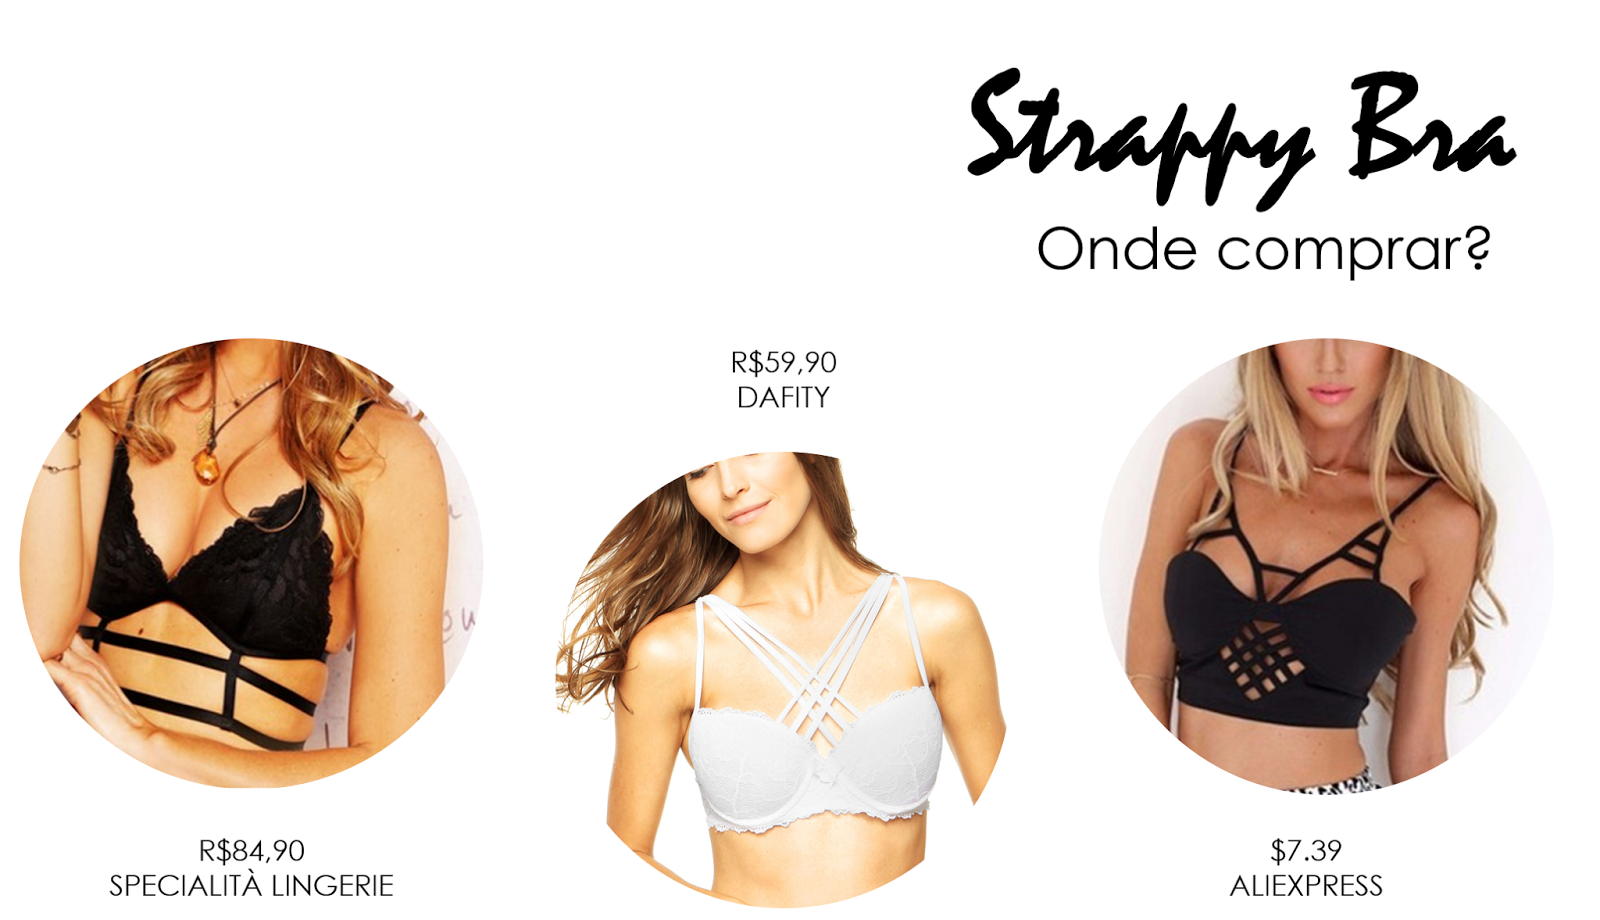 Strappy bra, comprar | Ally Arruda Blog